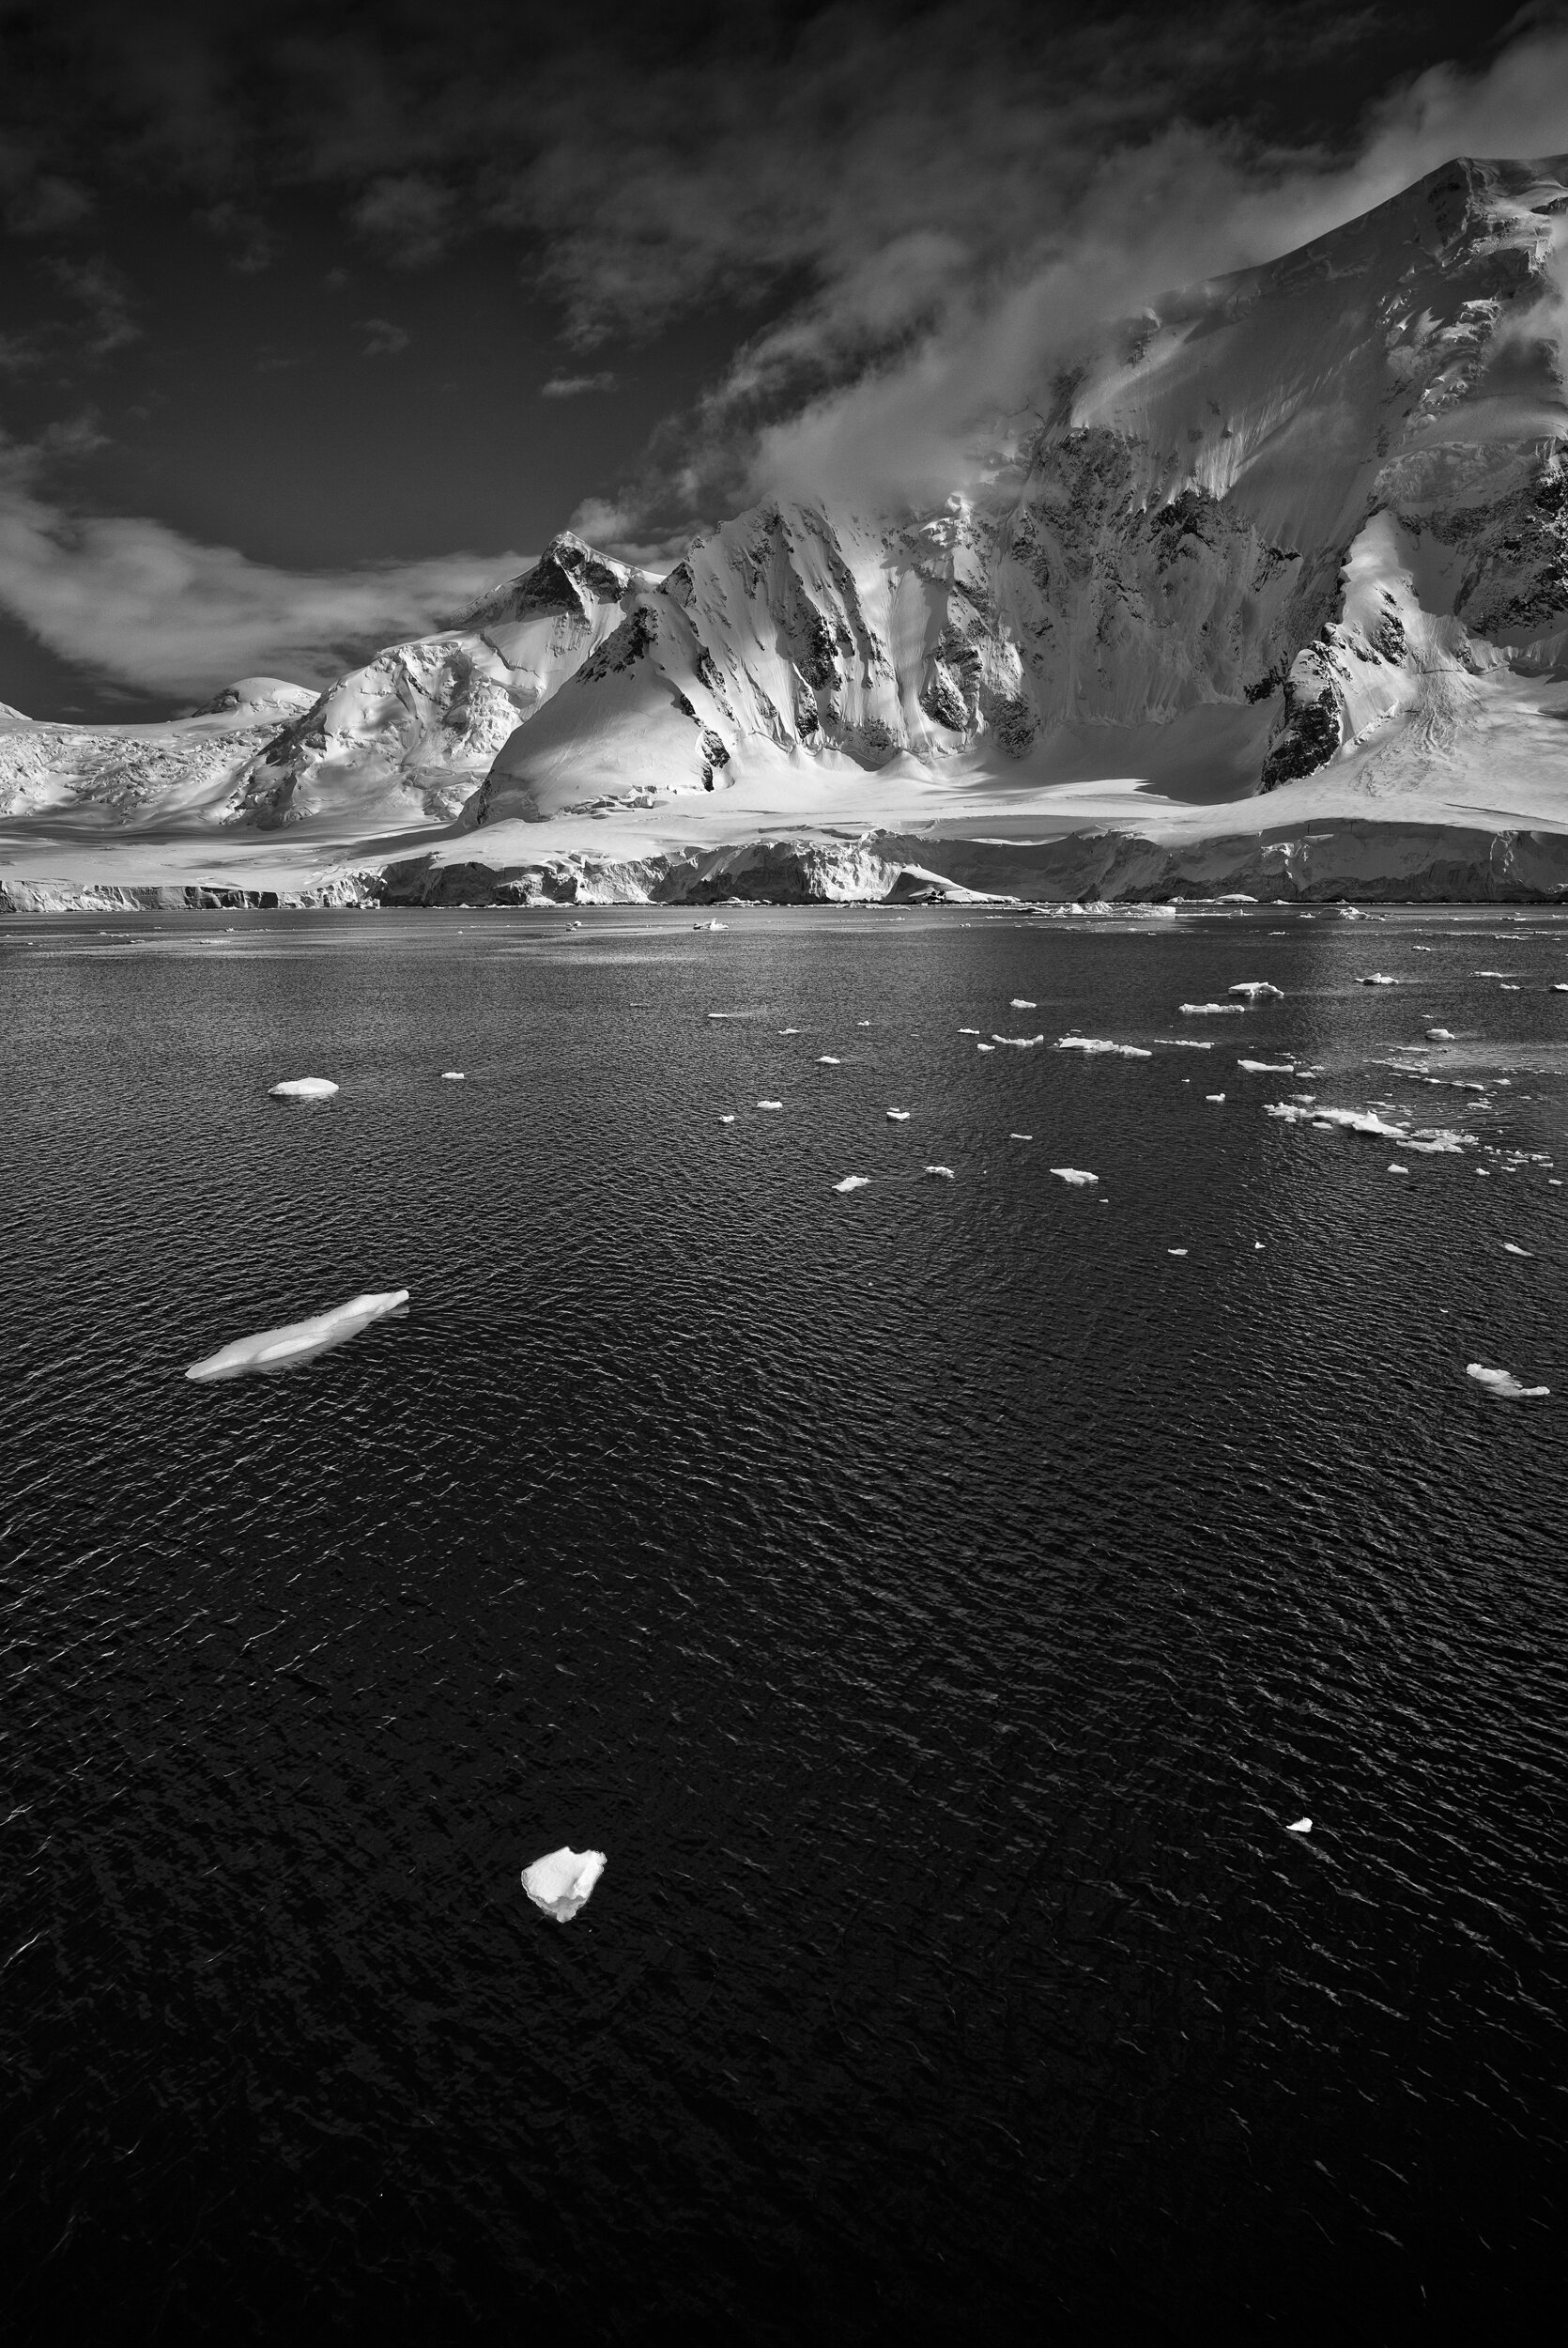 manuel_uebler_antarctica_bw_011.jpg